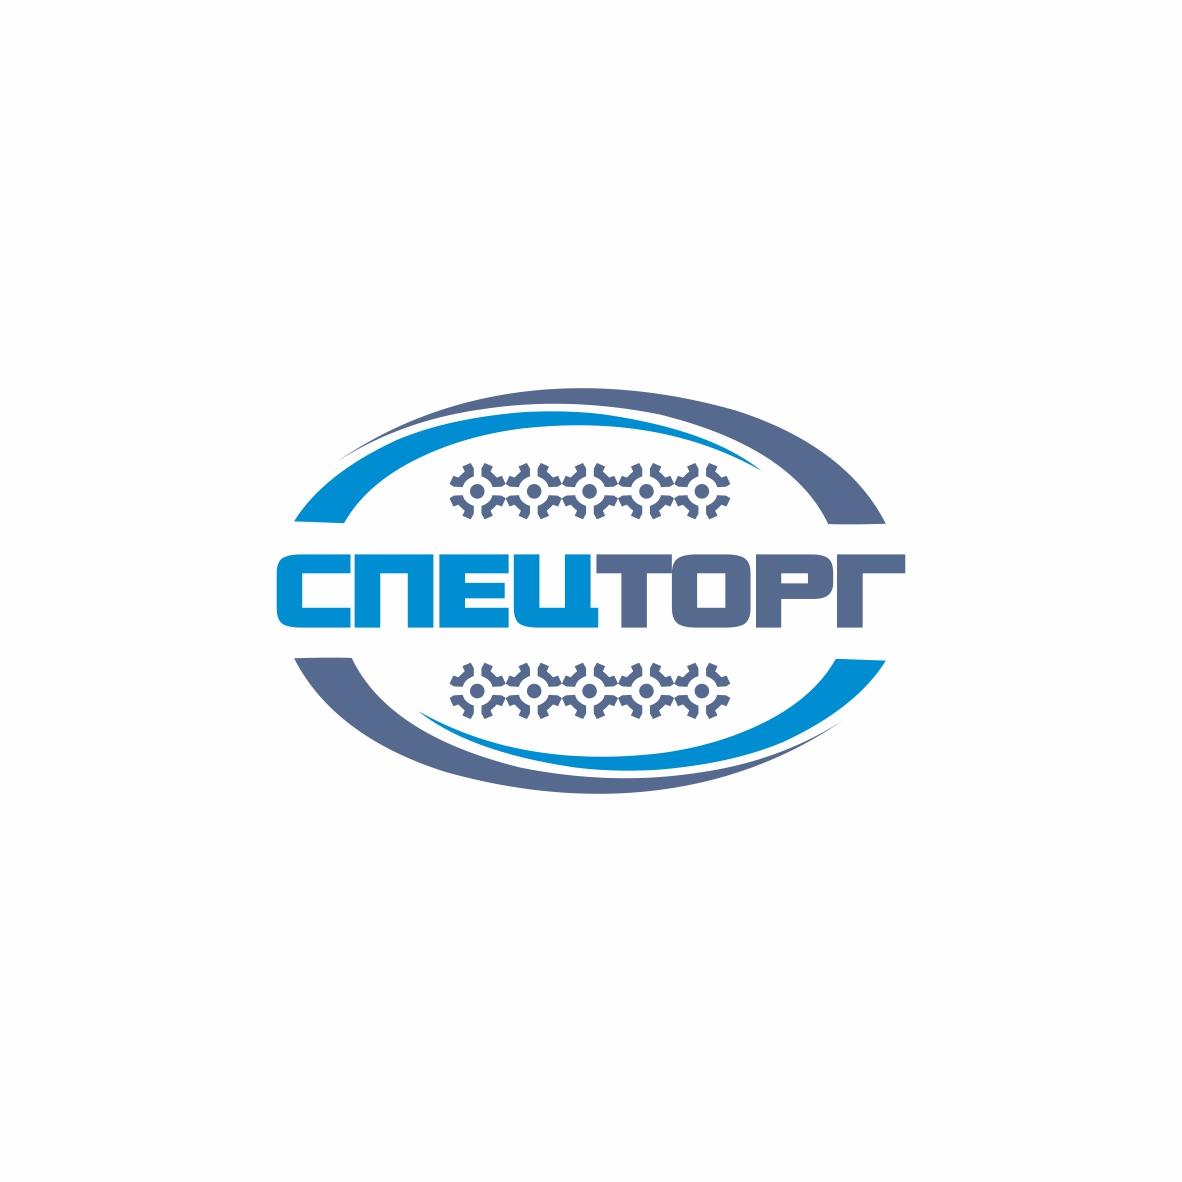 Разработать дизайн  логотипа компании фото f_2685dc336375edc4.jpg